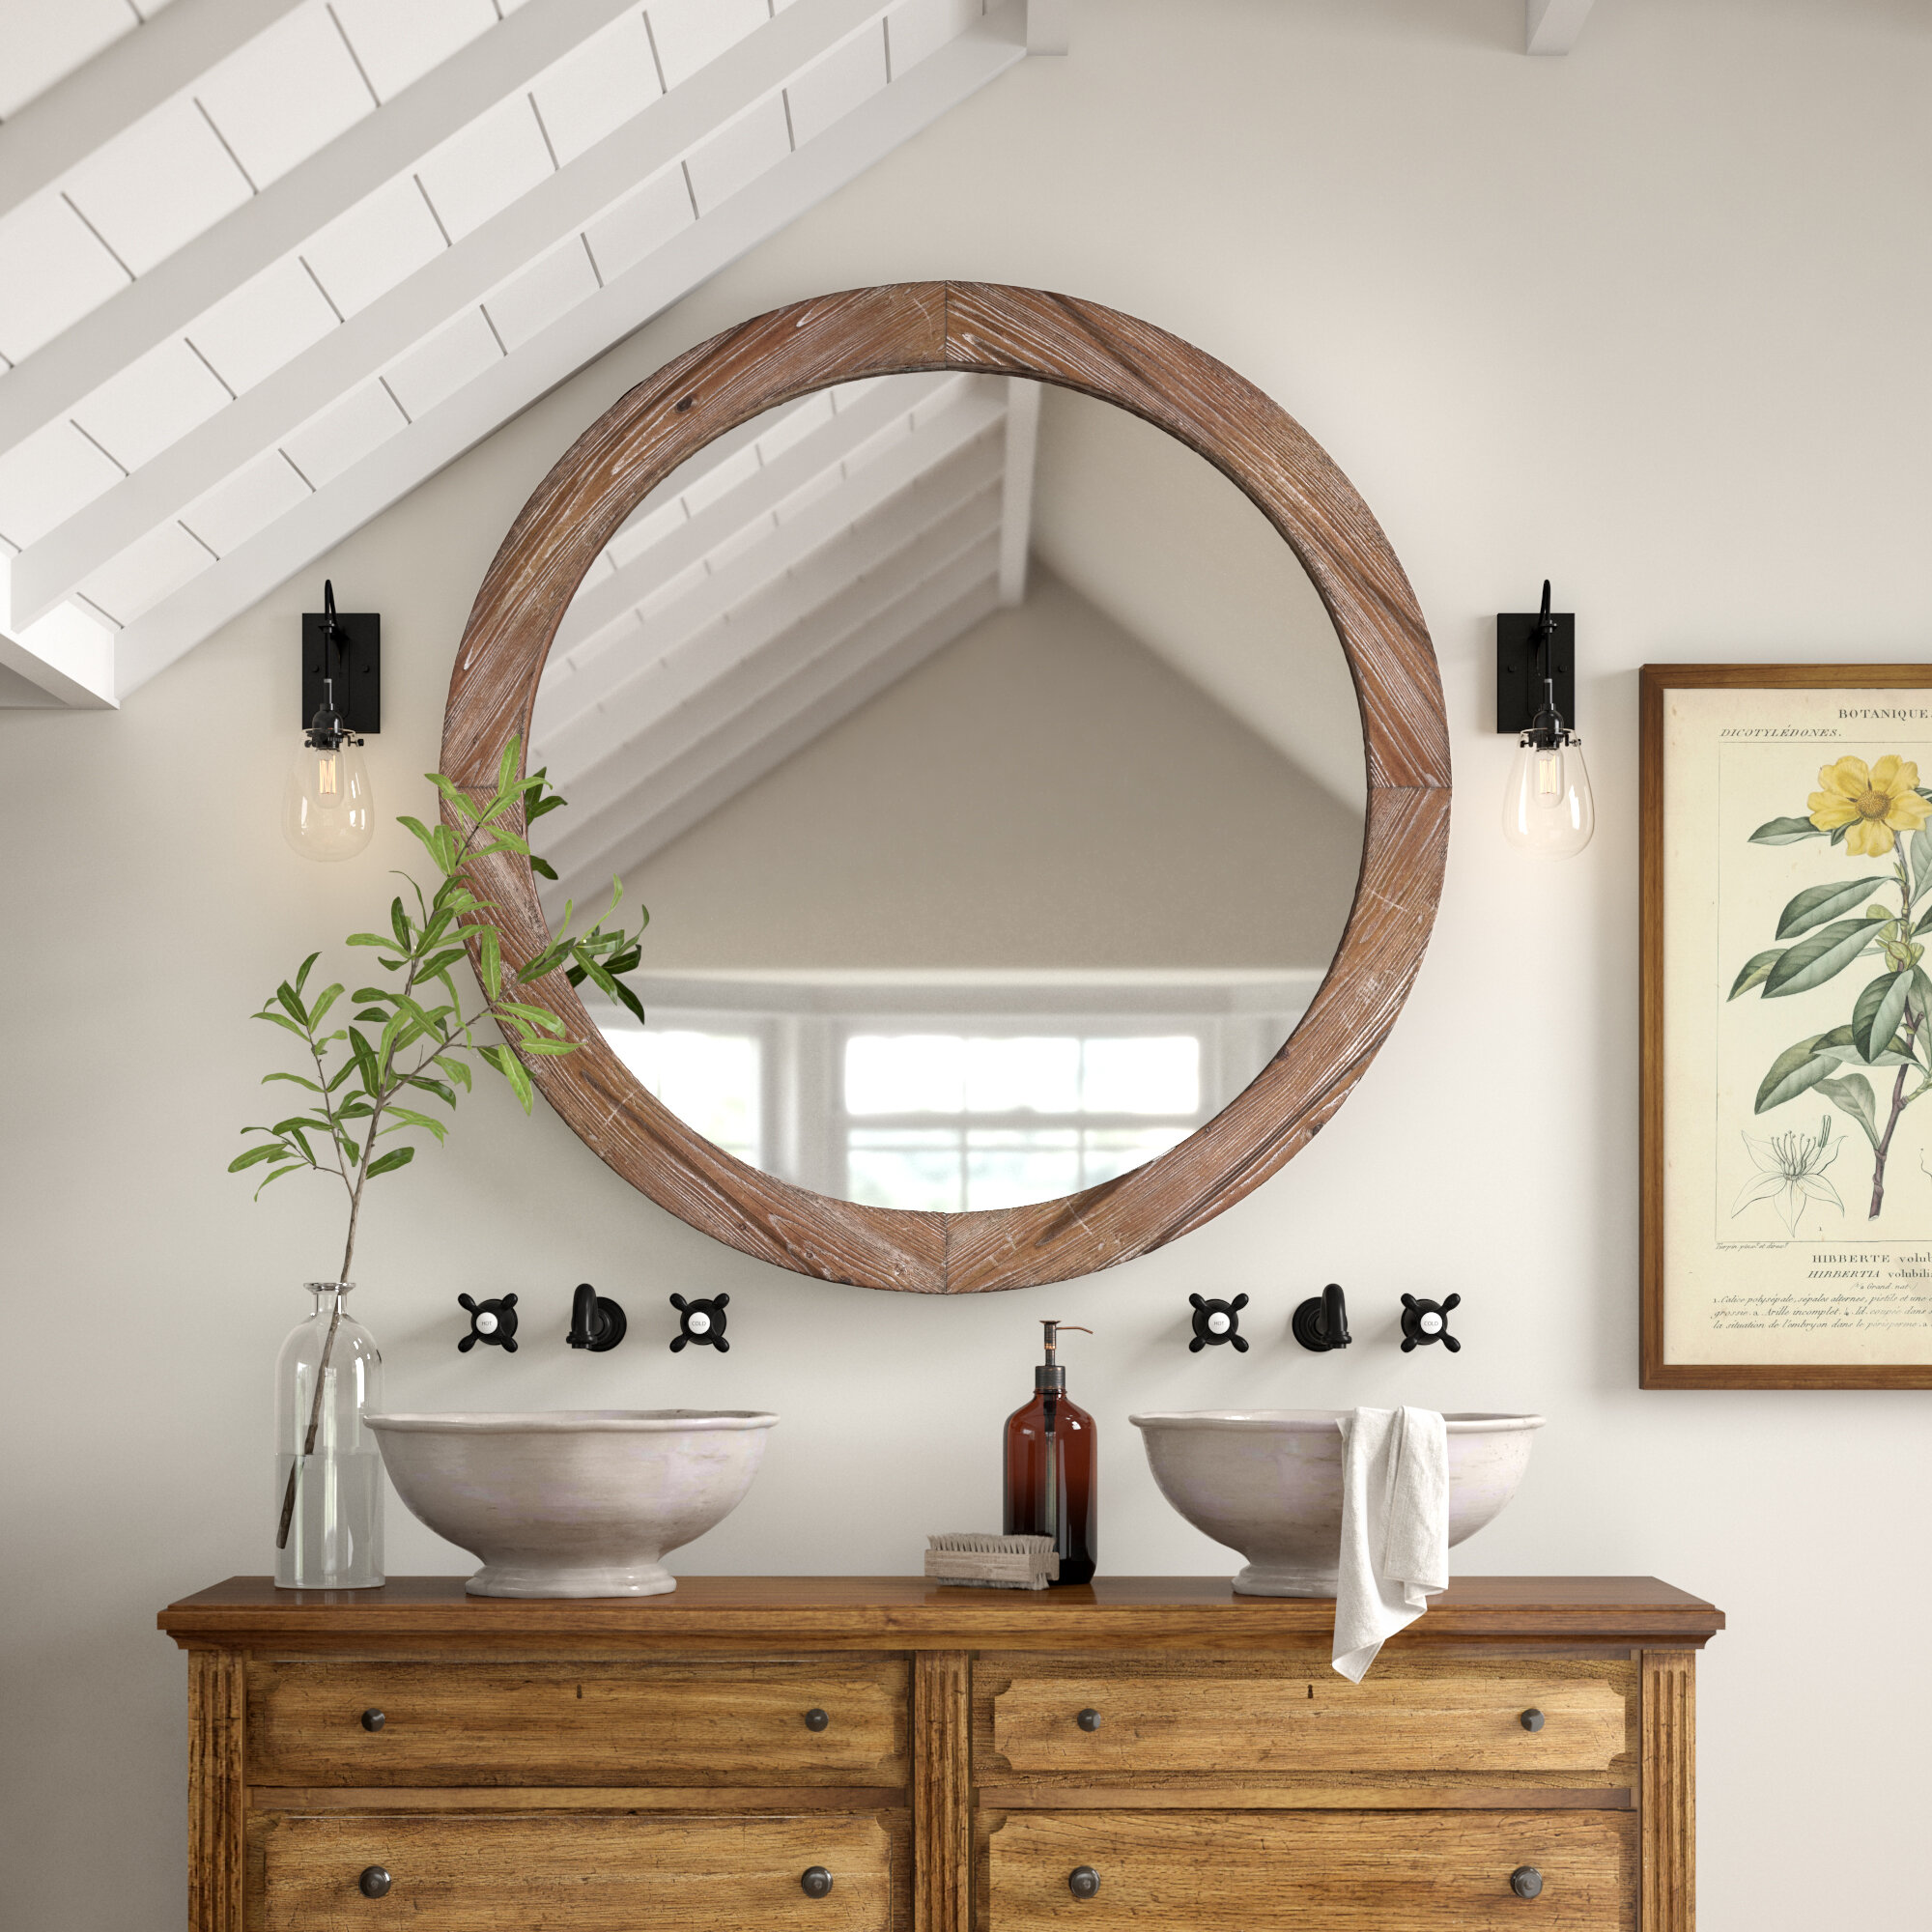 Bathroom Vanity Rustic Mirrors Free Shipping Over 35 Wayfair